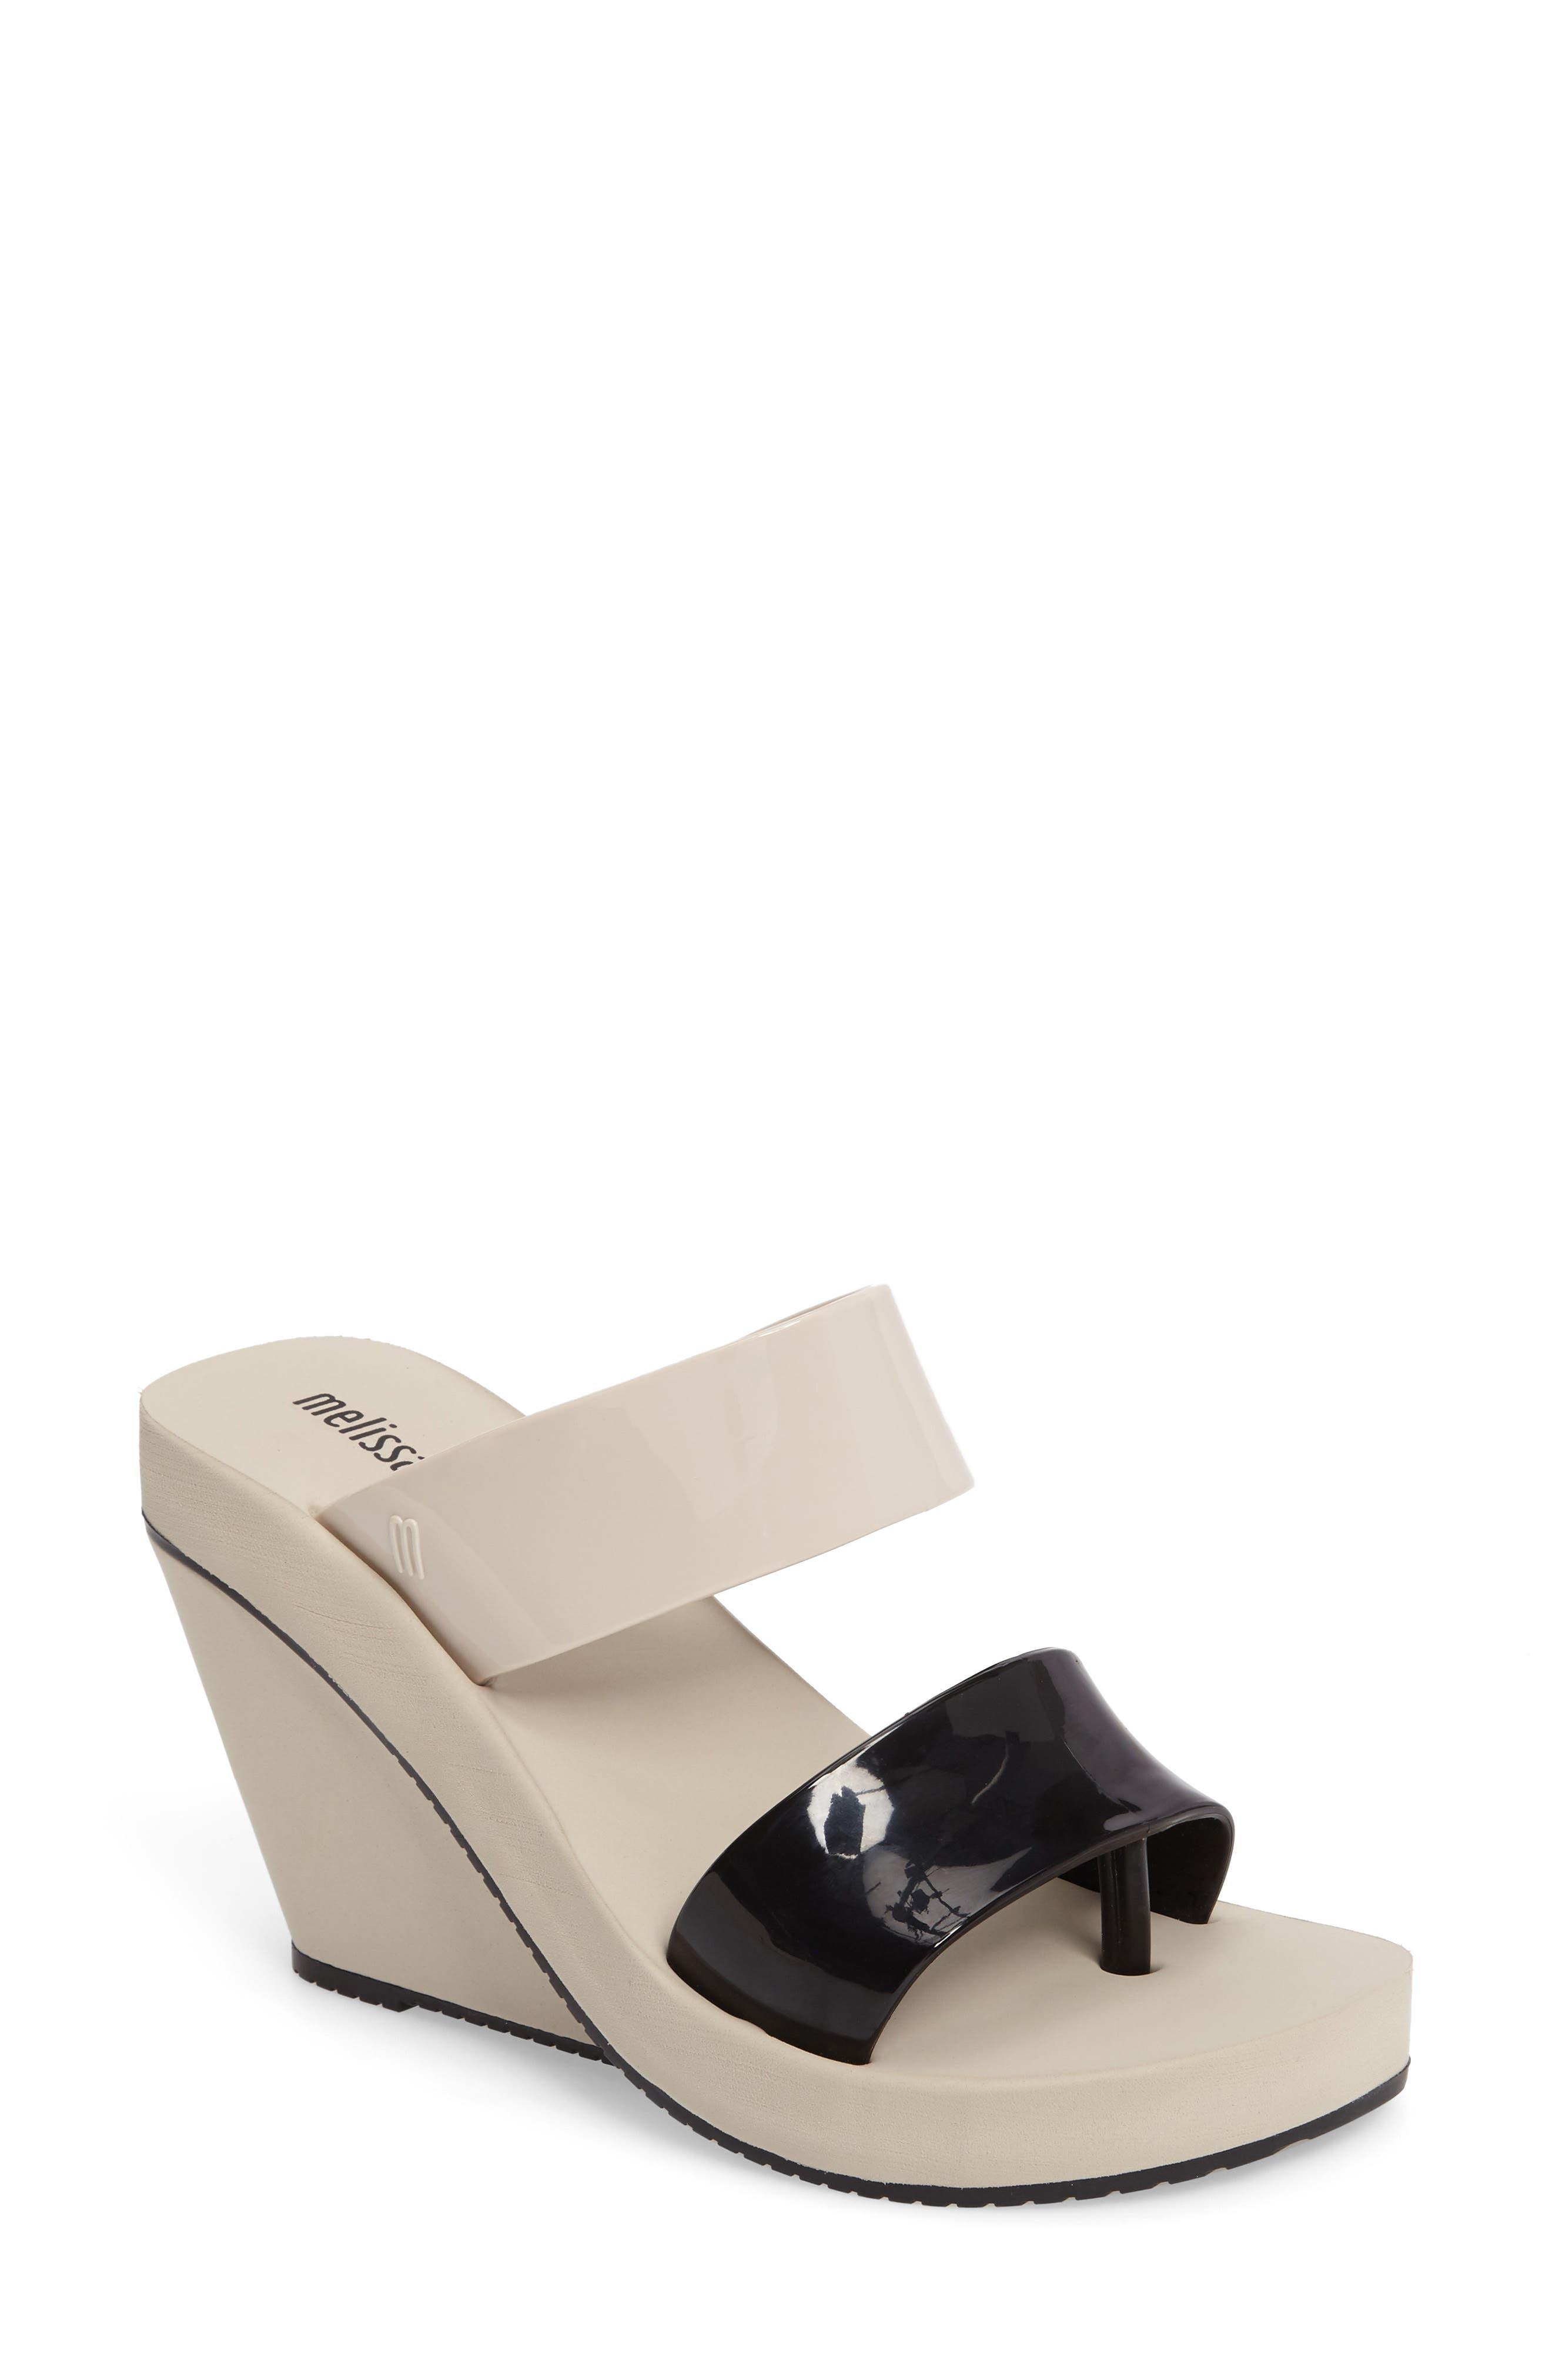 MELISSA Summer Wedge Sandal